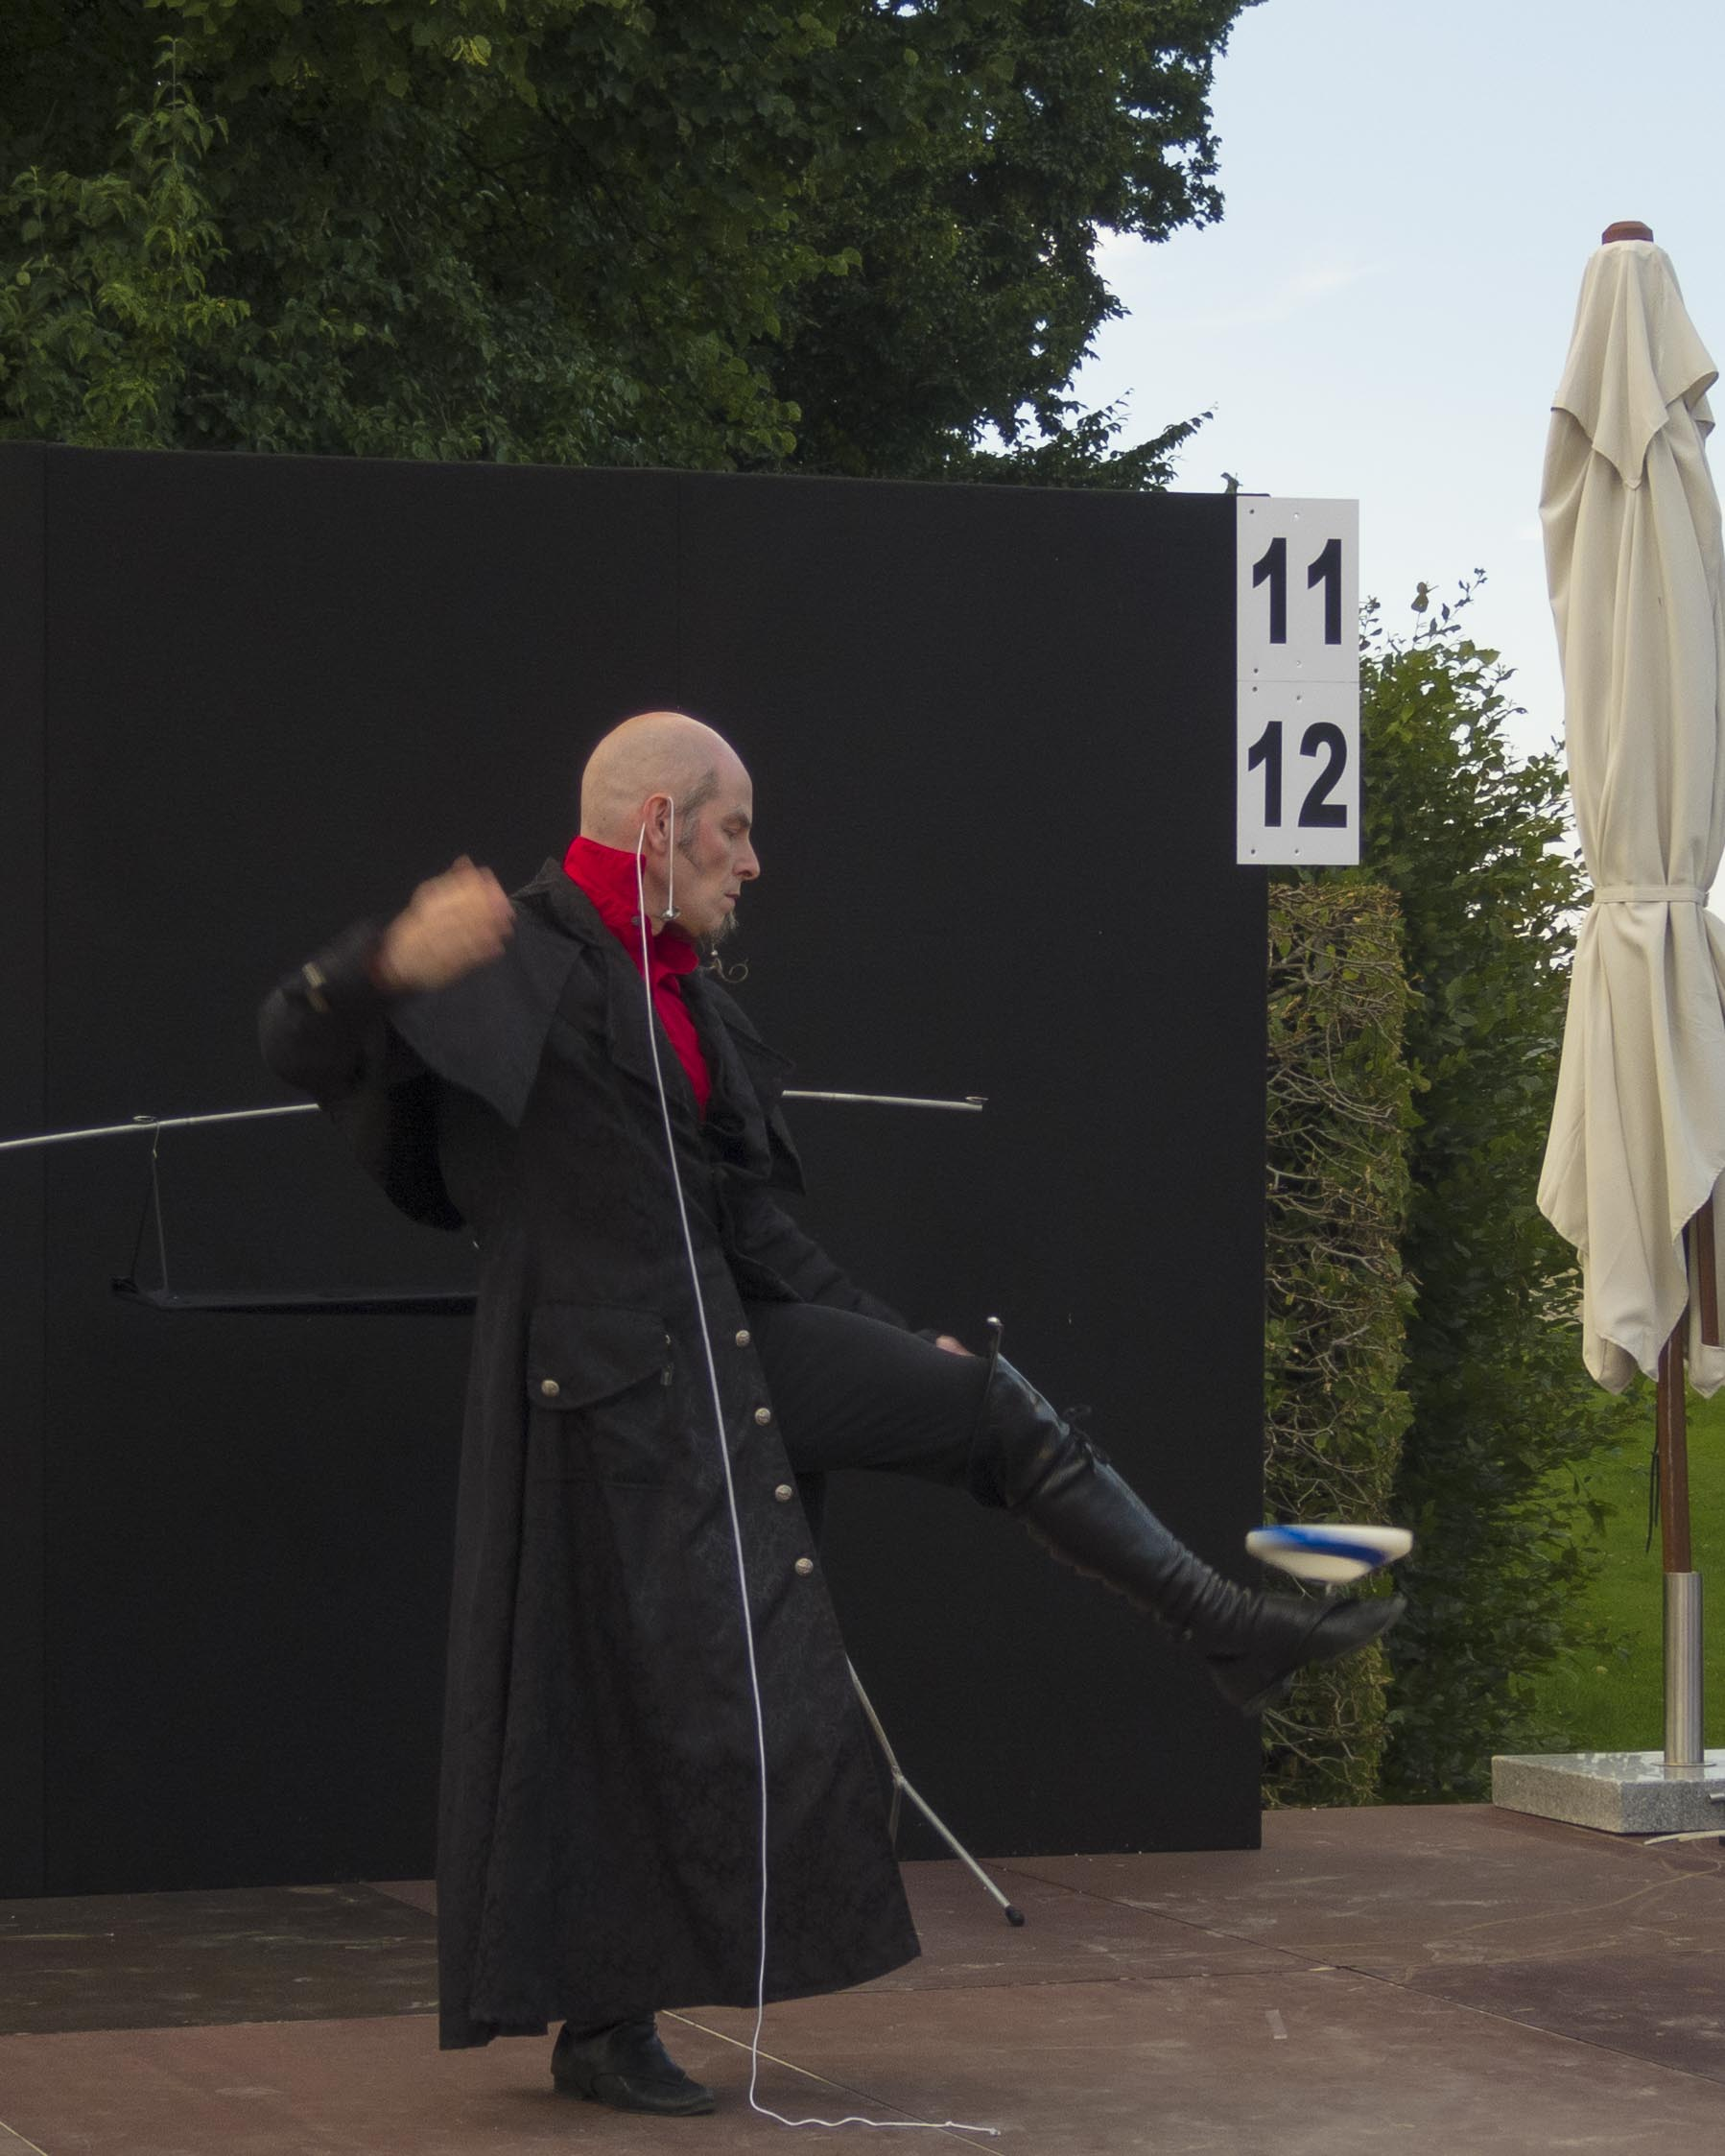 Jochen Schell: Kreiselshow